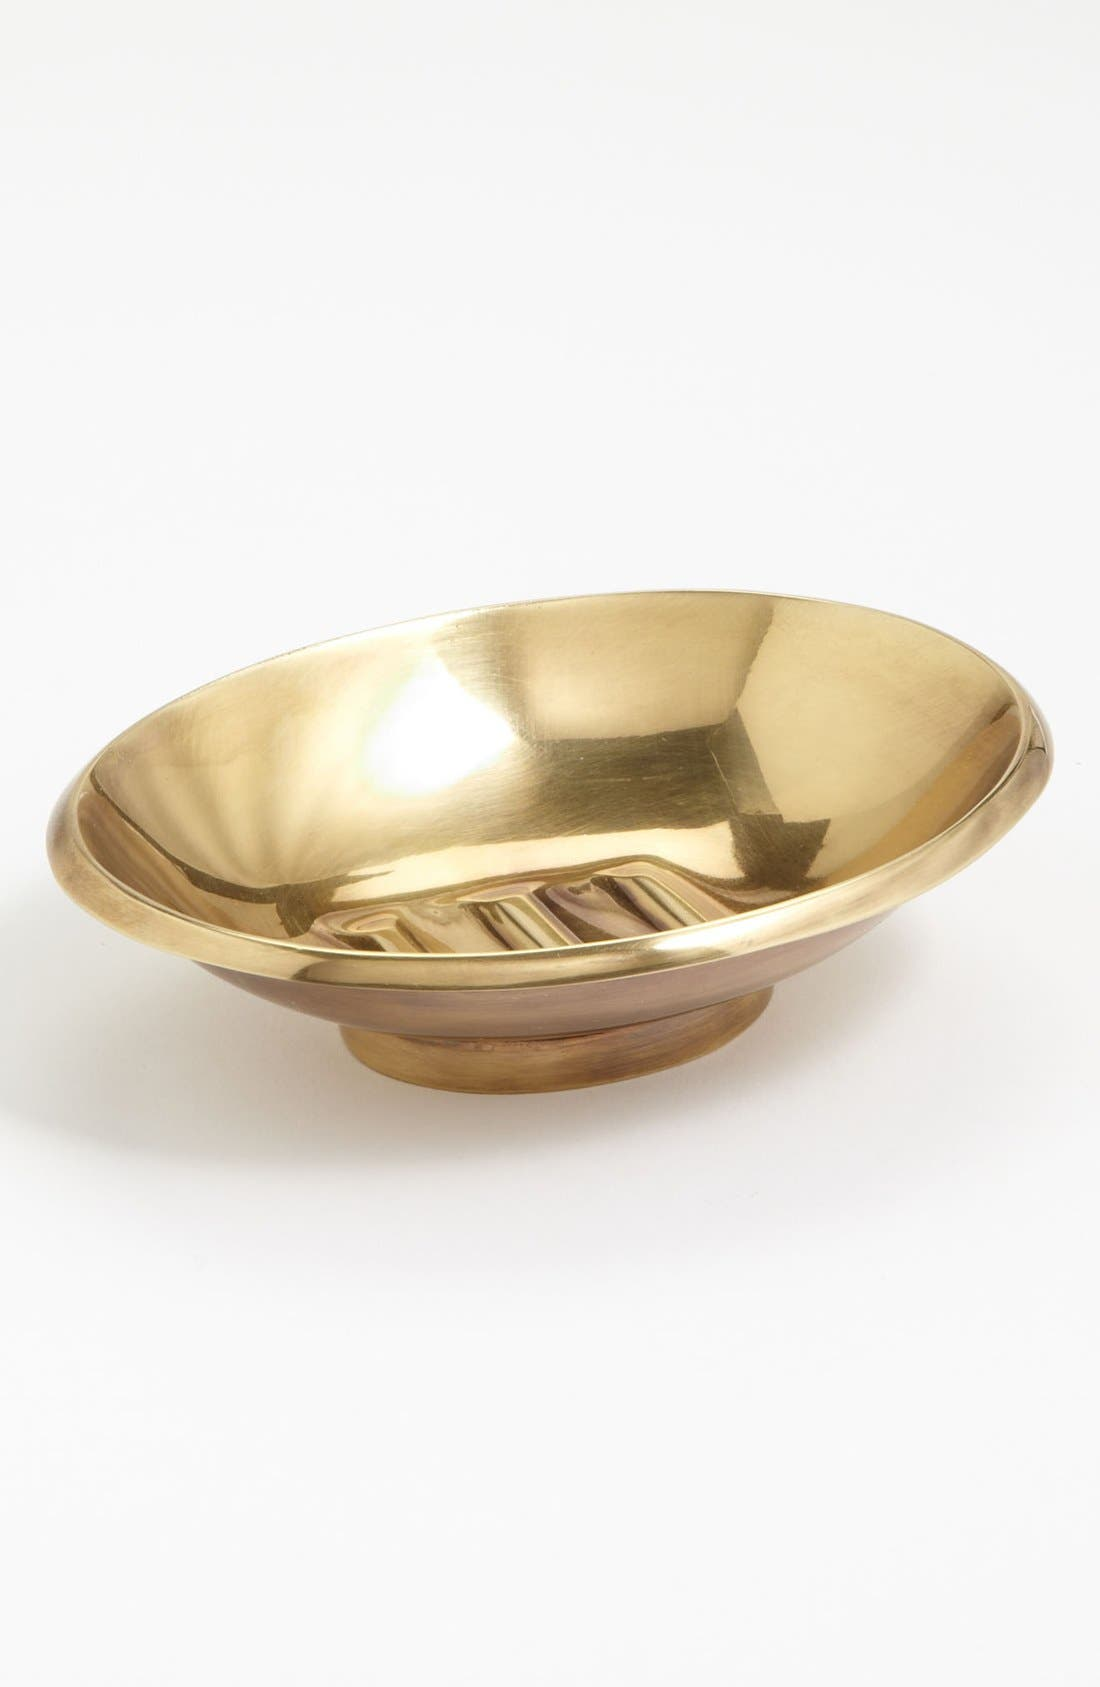 Waterworks Studio 'Wallingford' Soap Dish (Online Only)